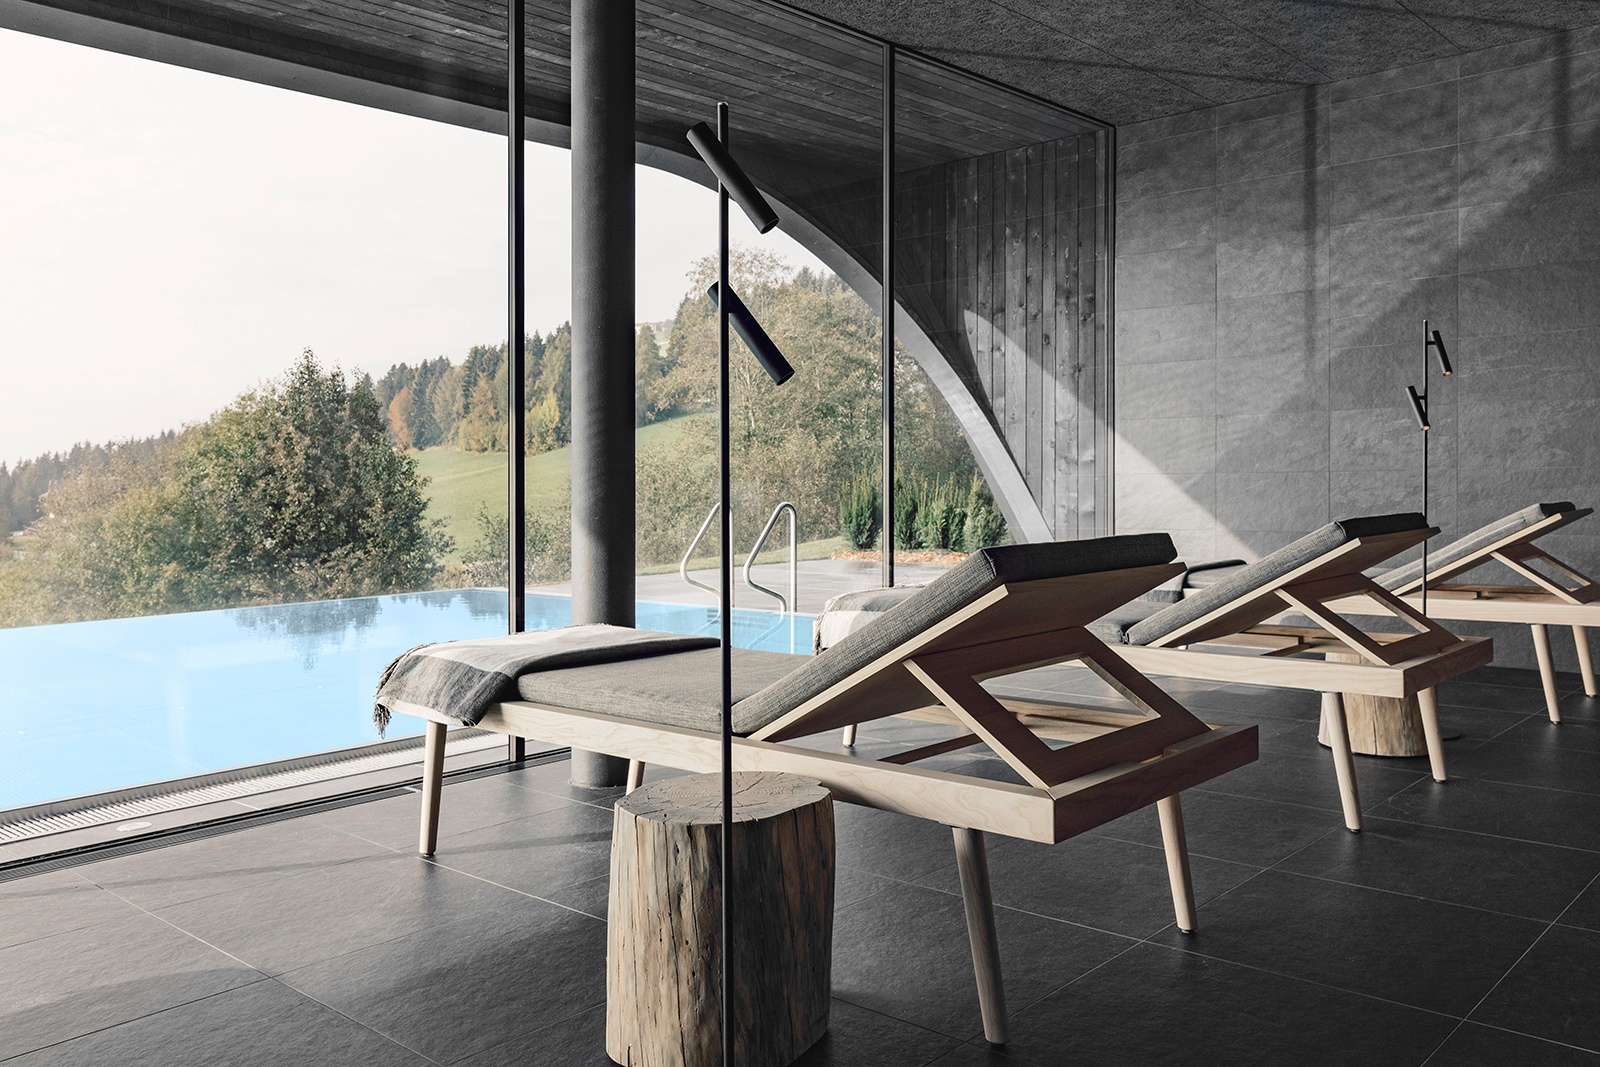 12_Peter_Pichler_Architecture_Hotel_Milla_Montis